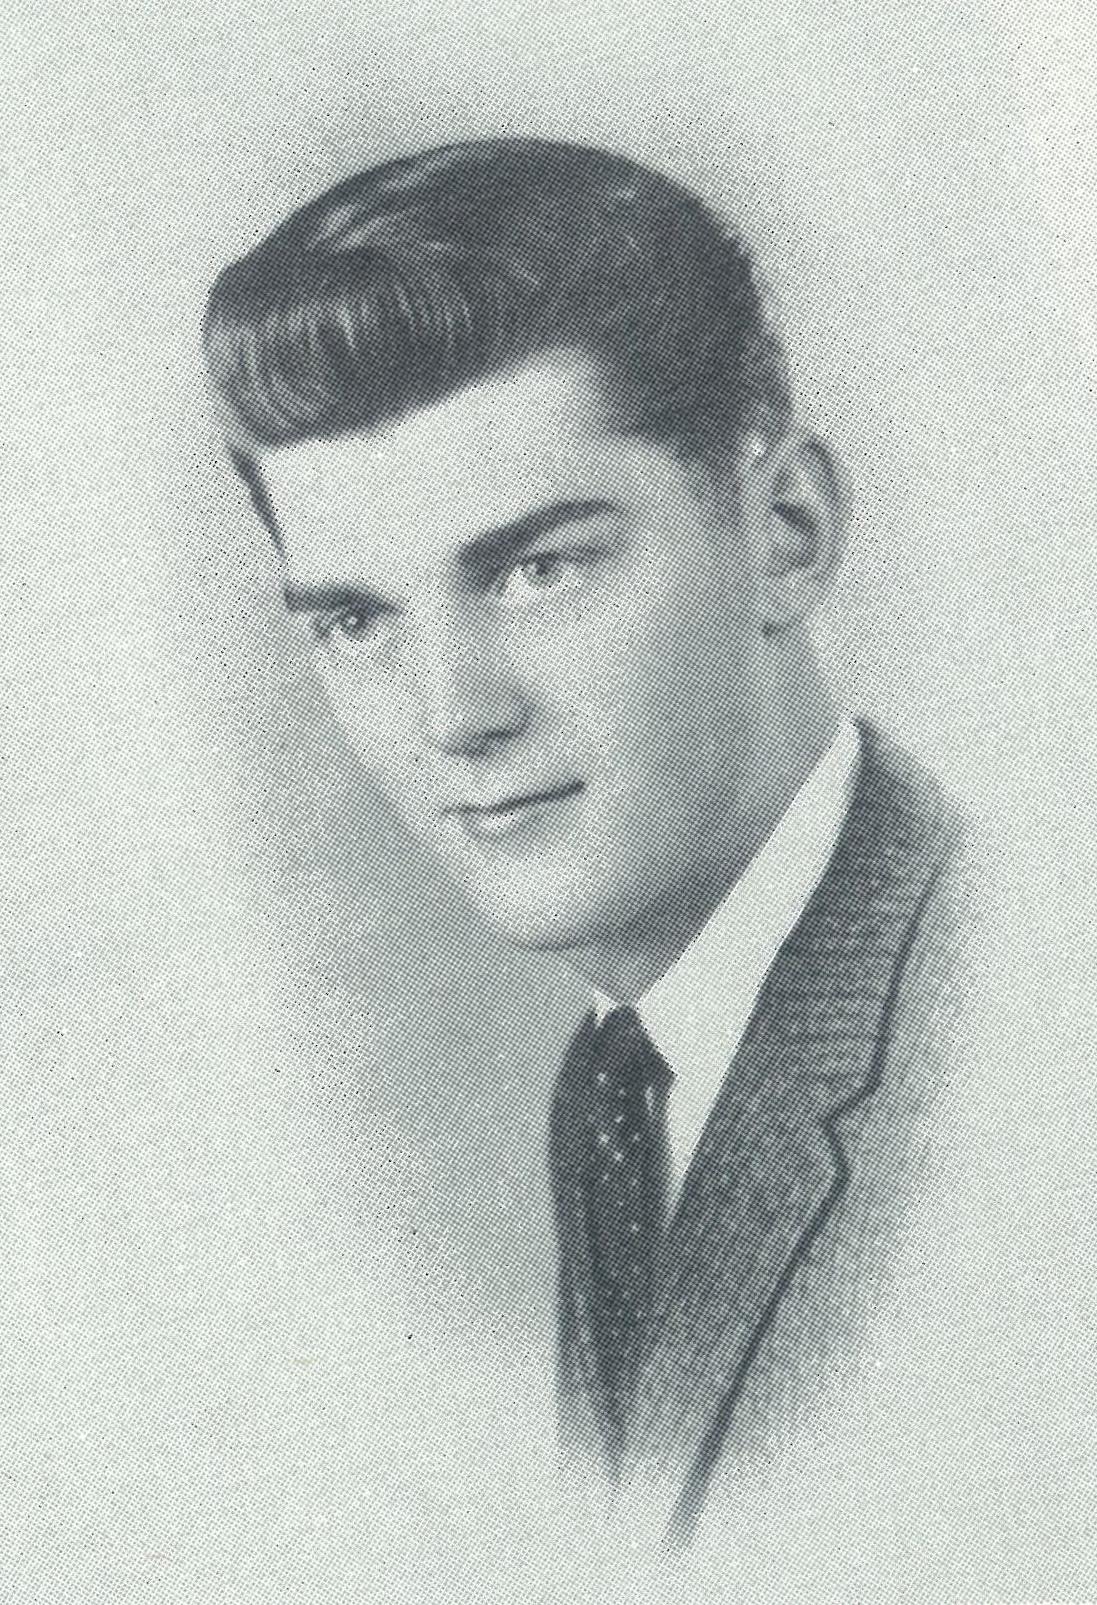 Joel Egge's senior photo from the 1959 beacon.